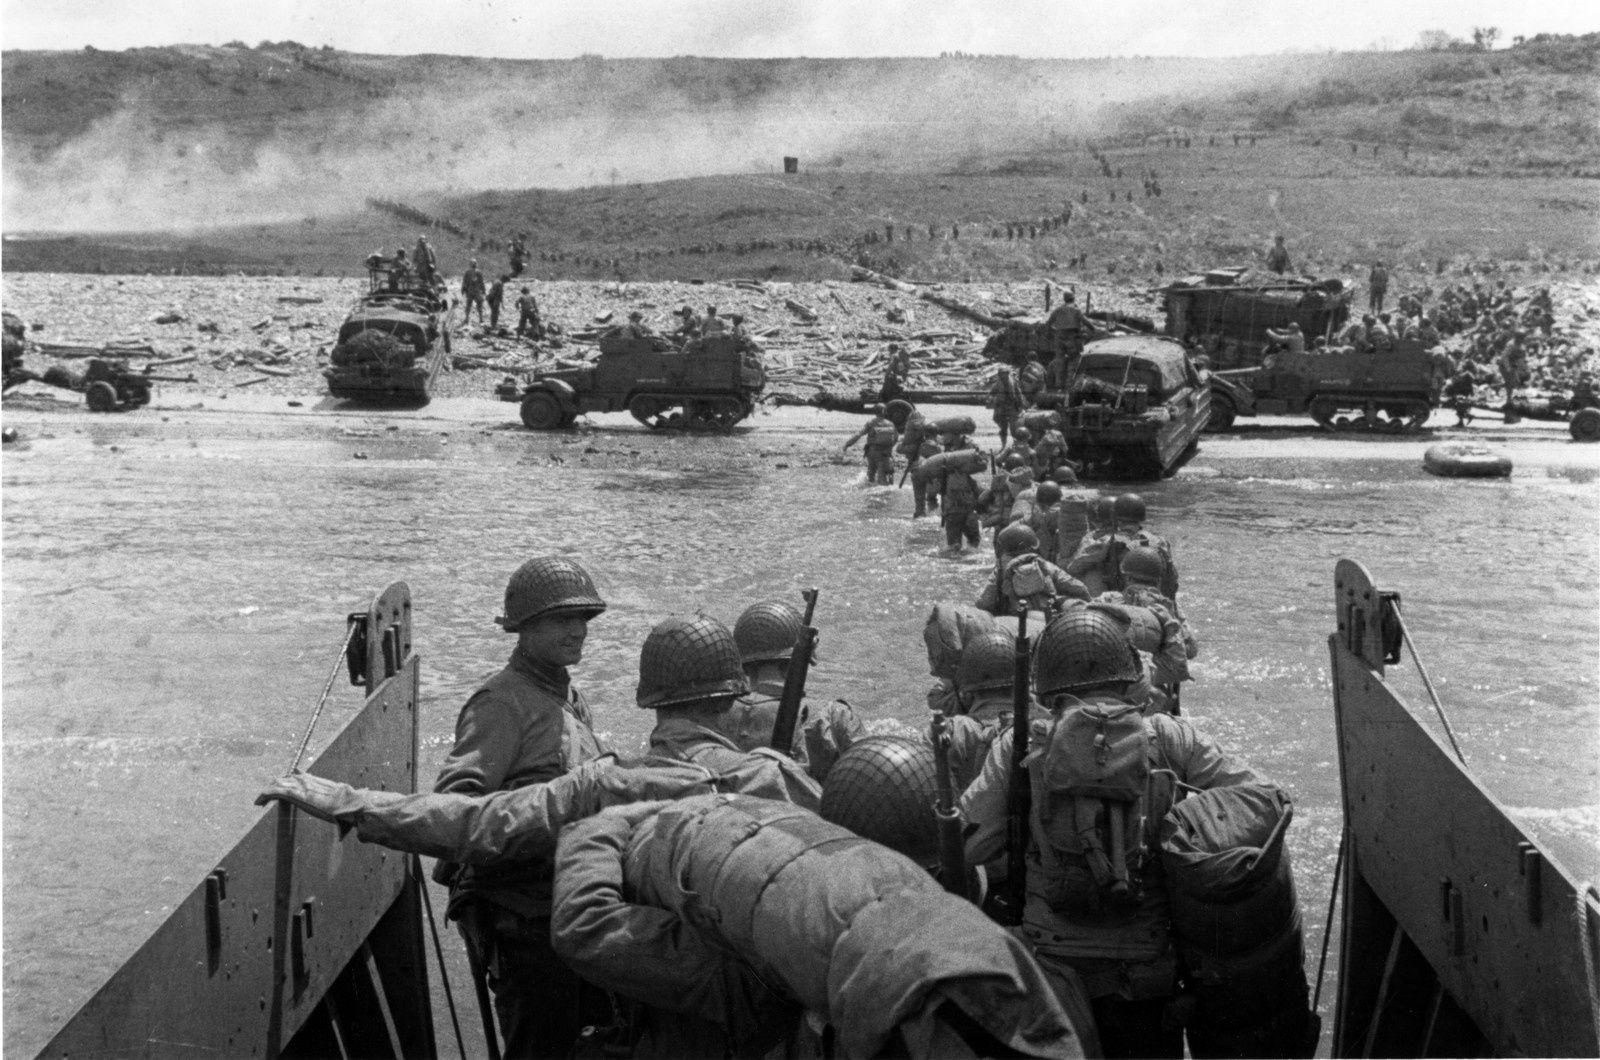 Débarquement à Omaha Beach, Normandie, 6 juin 1944. Photographie de Robert Capa.